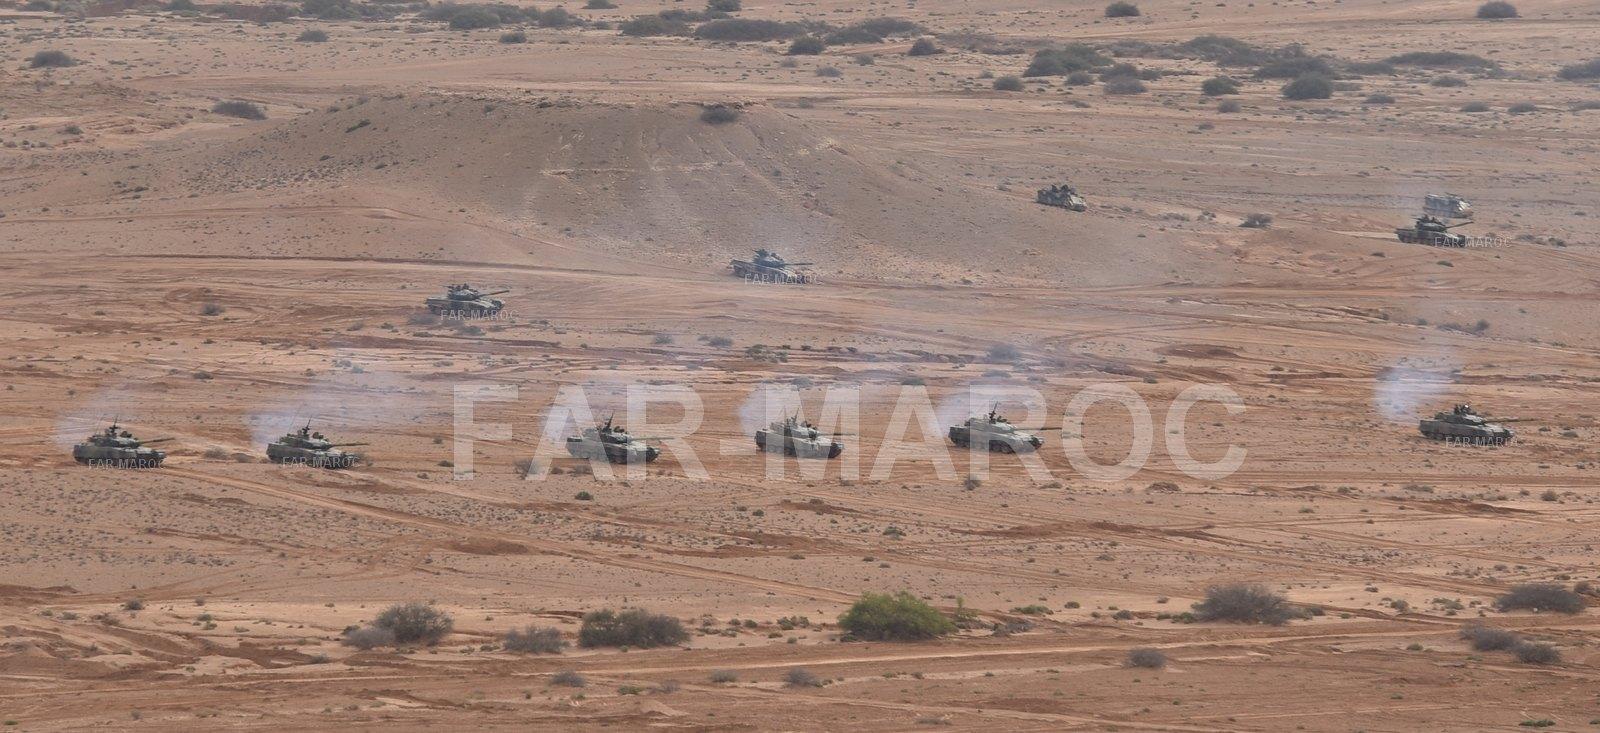 Chars VT-1A Marocains / Moroccan VT-1A MBT - Page 31 49164618952_910c81e583_h